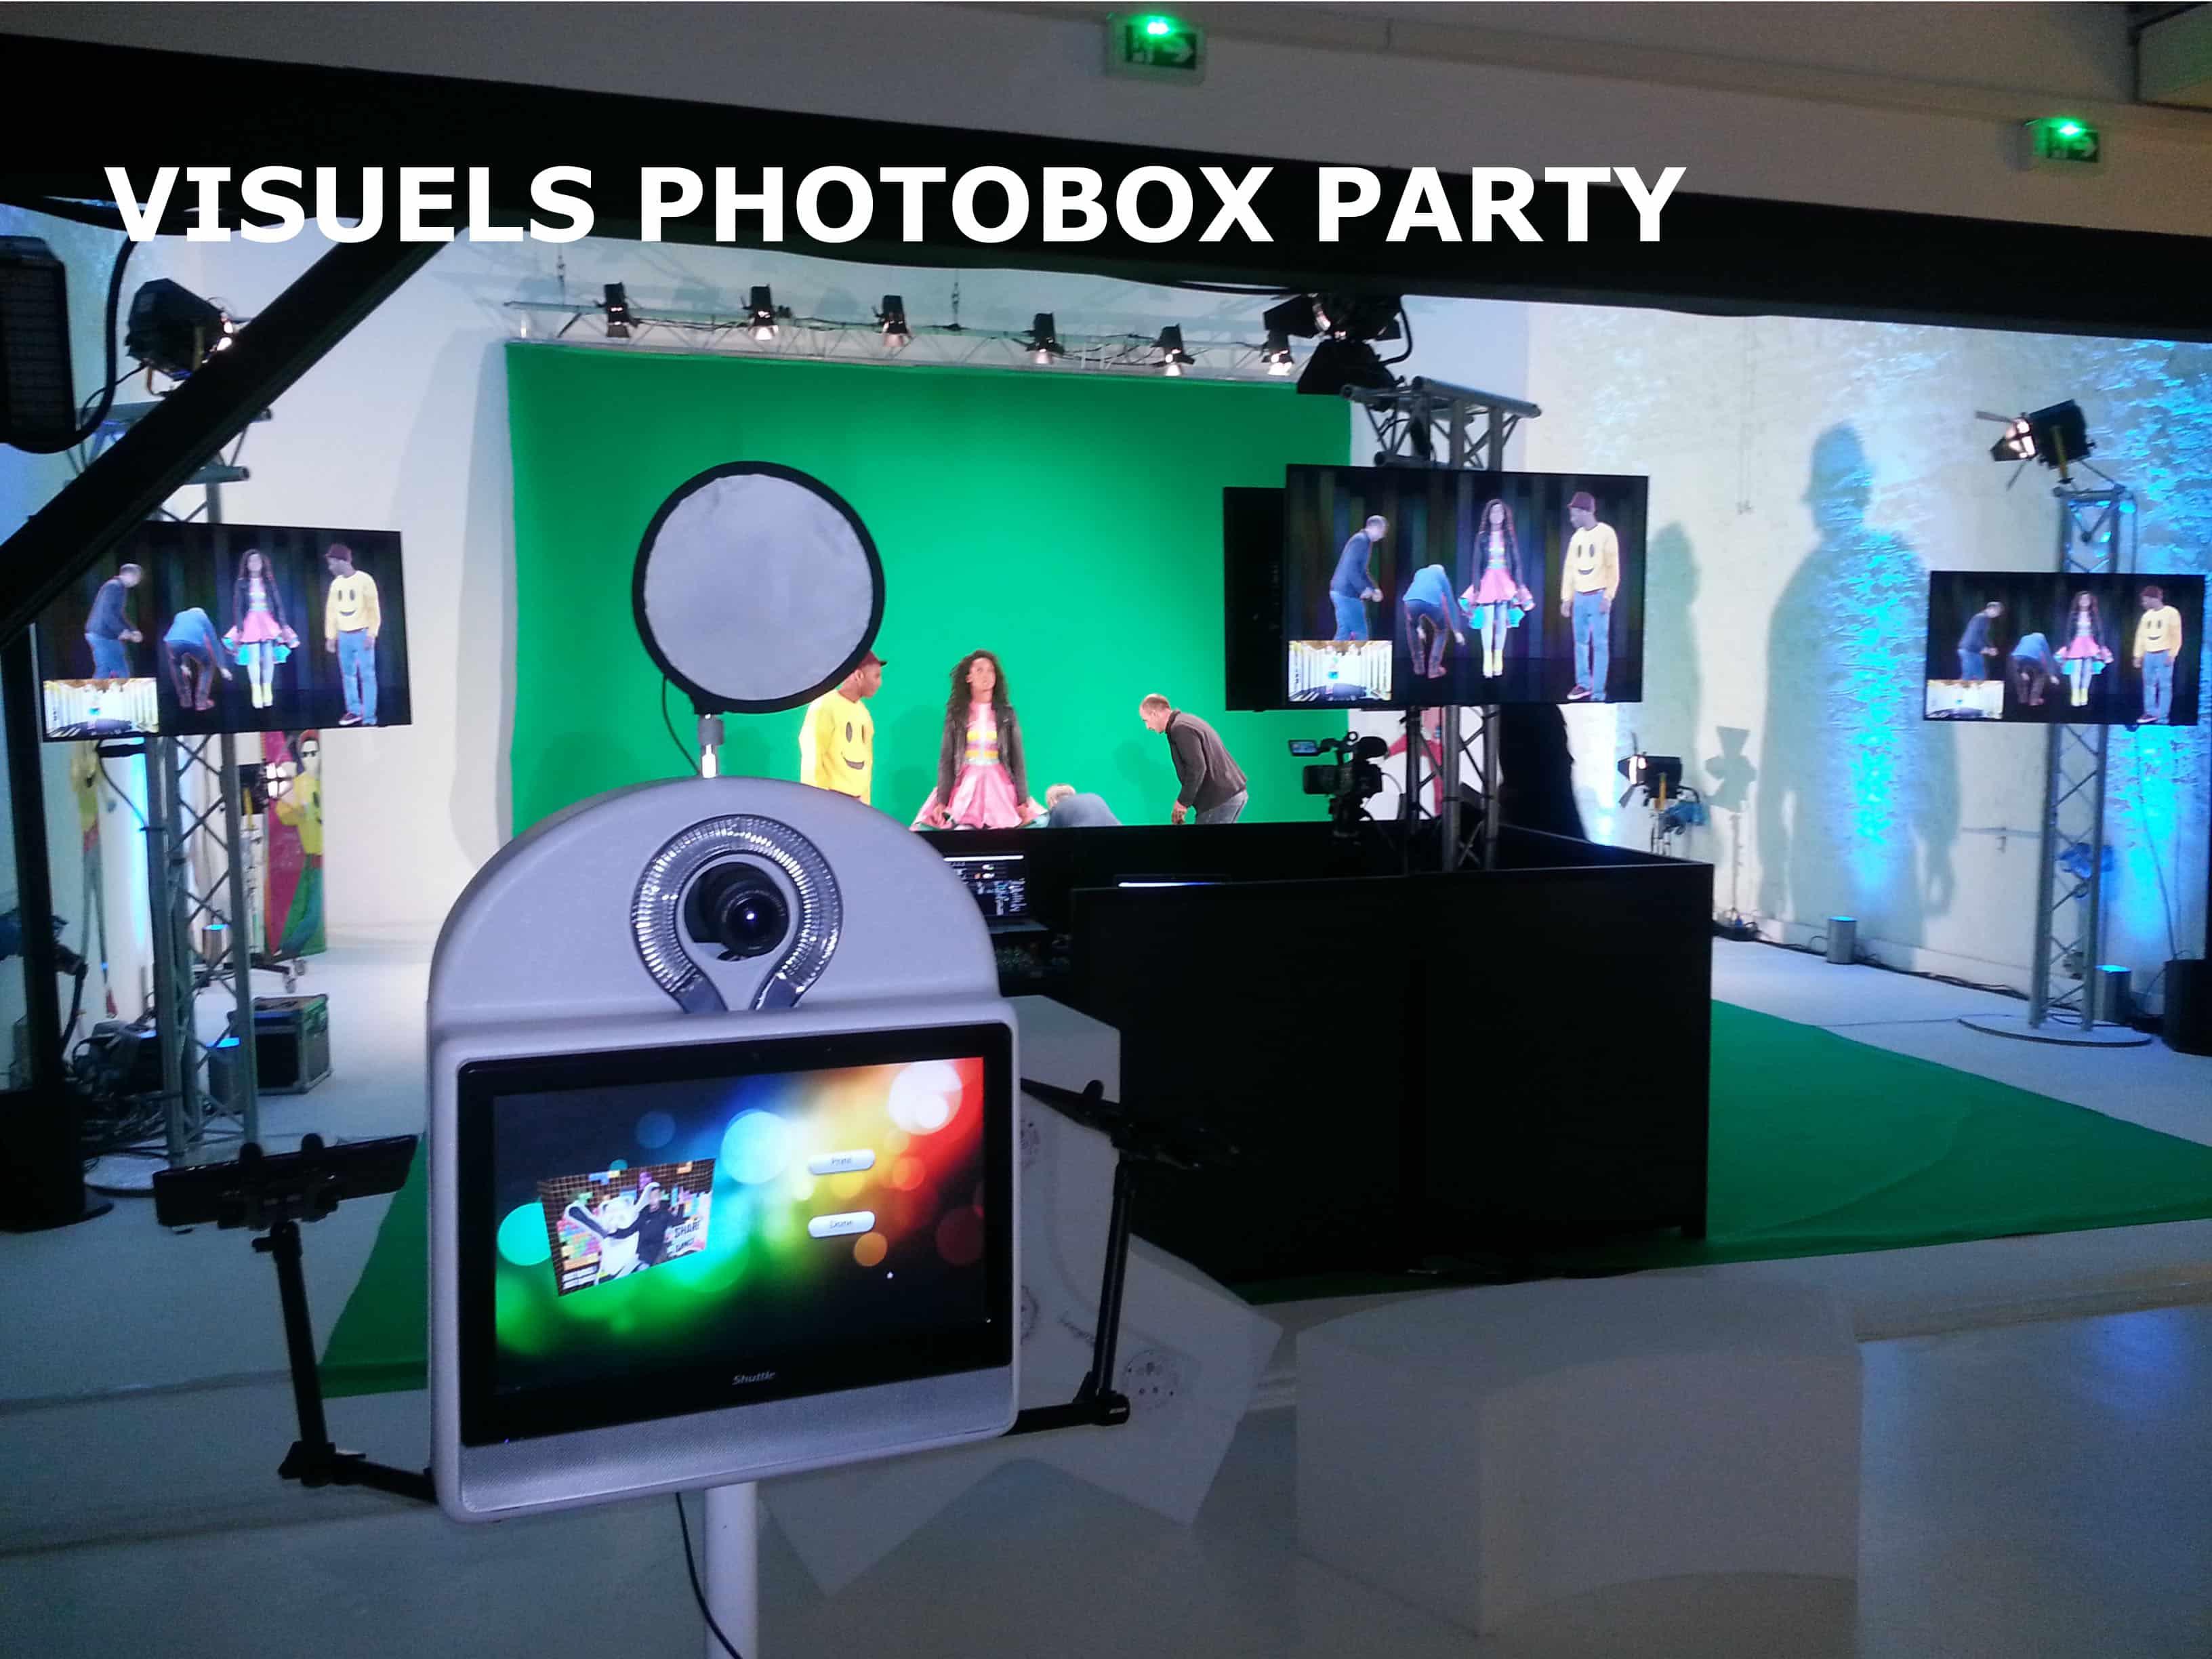 photobooth paris 1 - Photobooth et vidéobooth Paris, Location photomaton